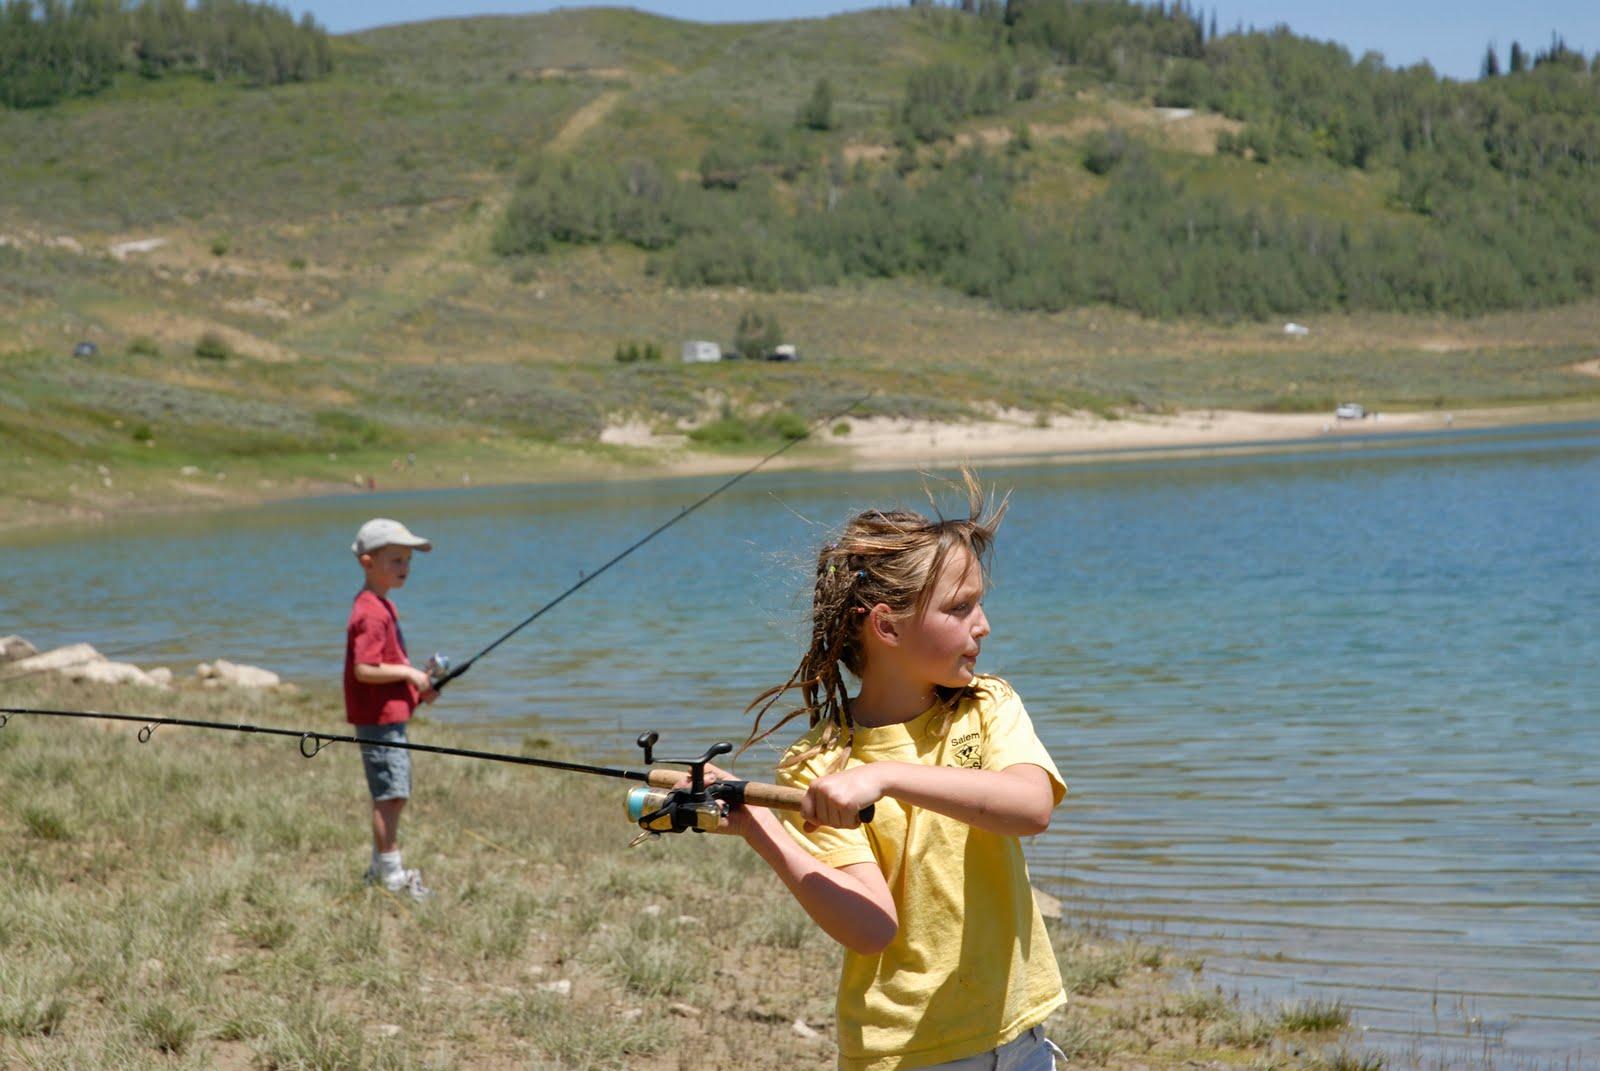 Backcountry utah 39 s outdoor adventure journal fish for for Utah fishing license cost